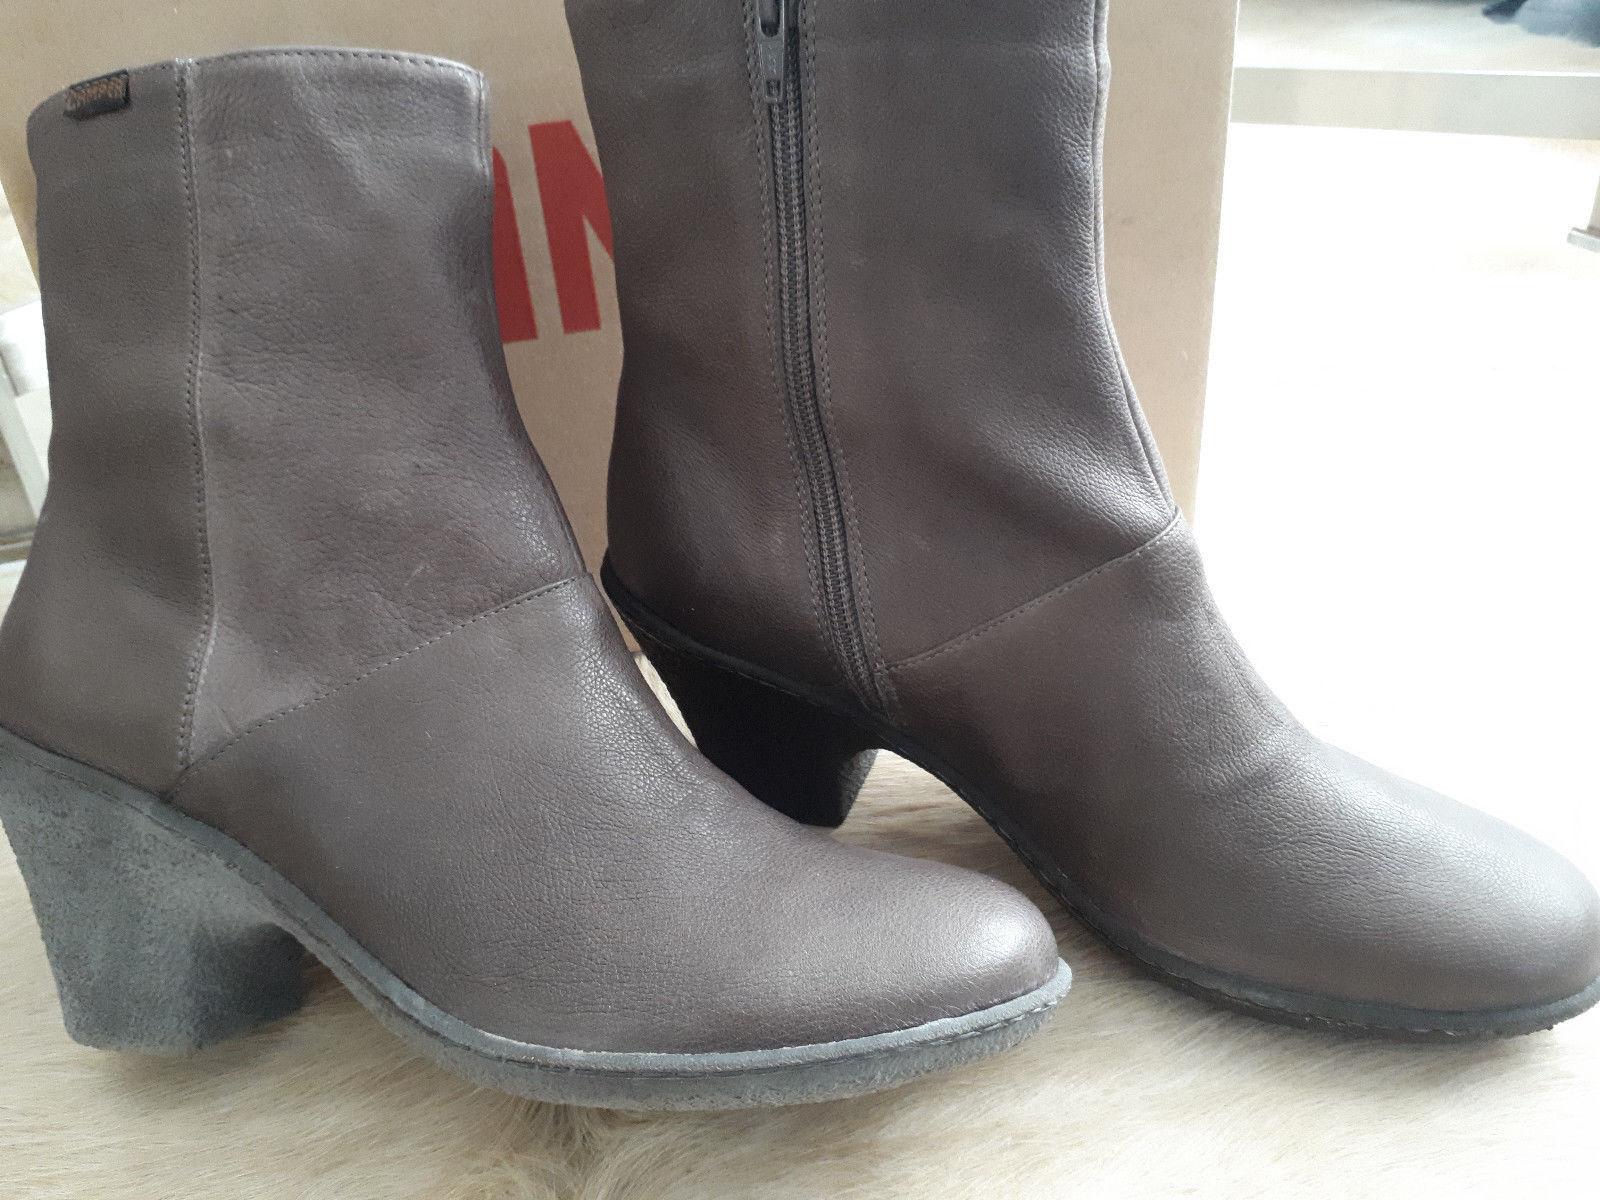 NEU  CAMPER  Stiefeletten  Leder  Stiefel  Schuhe  Gr. 41  taupe